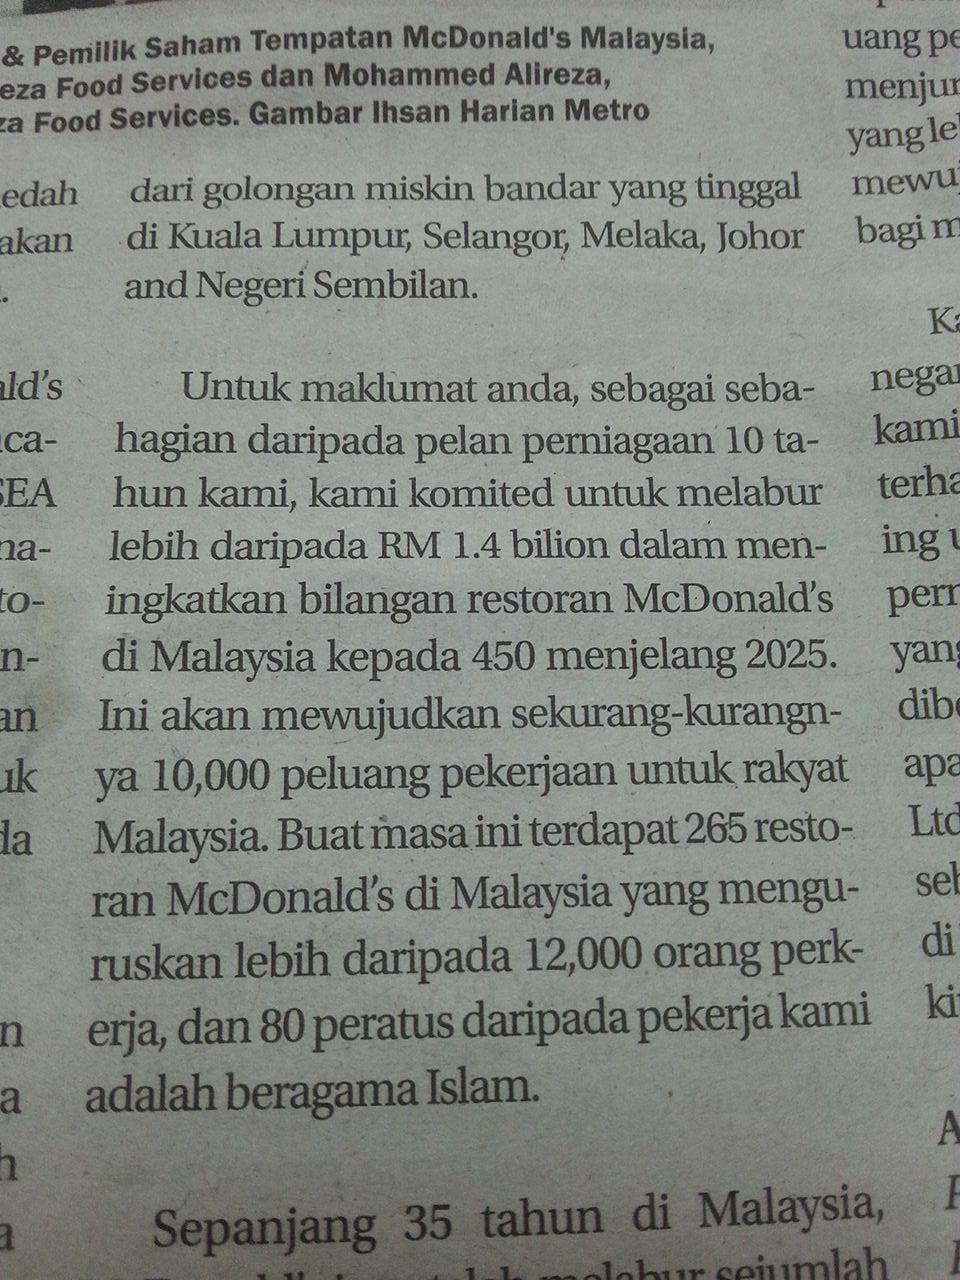 Boikot McDonald's Malaysia: Apa Kata Mufti Wilayah Persekutuan?